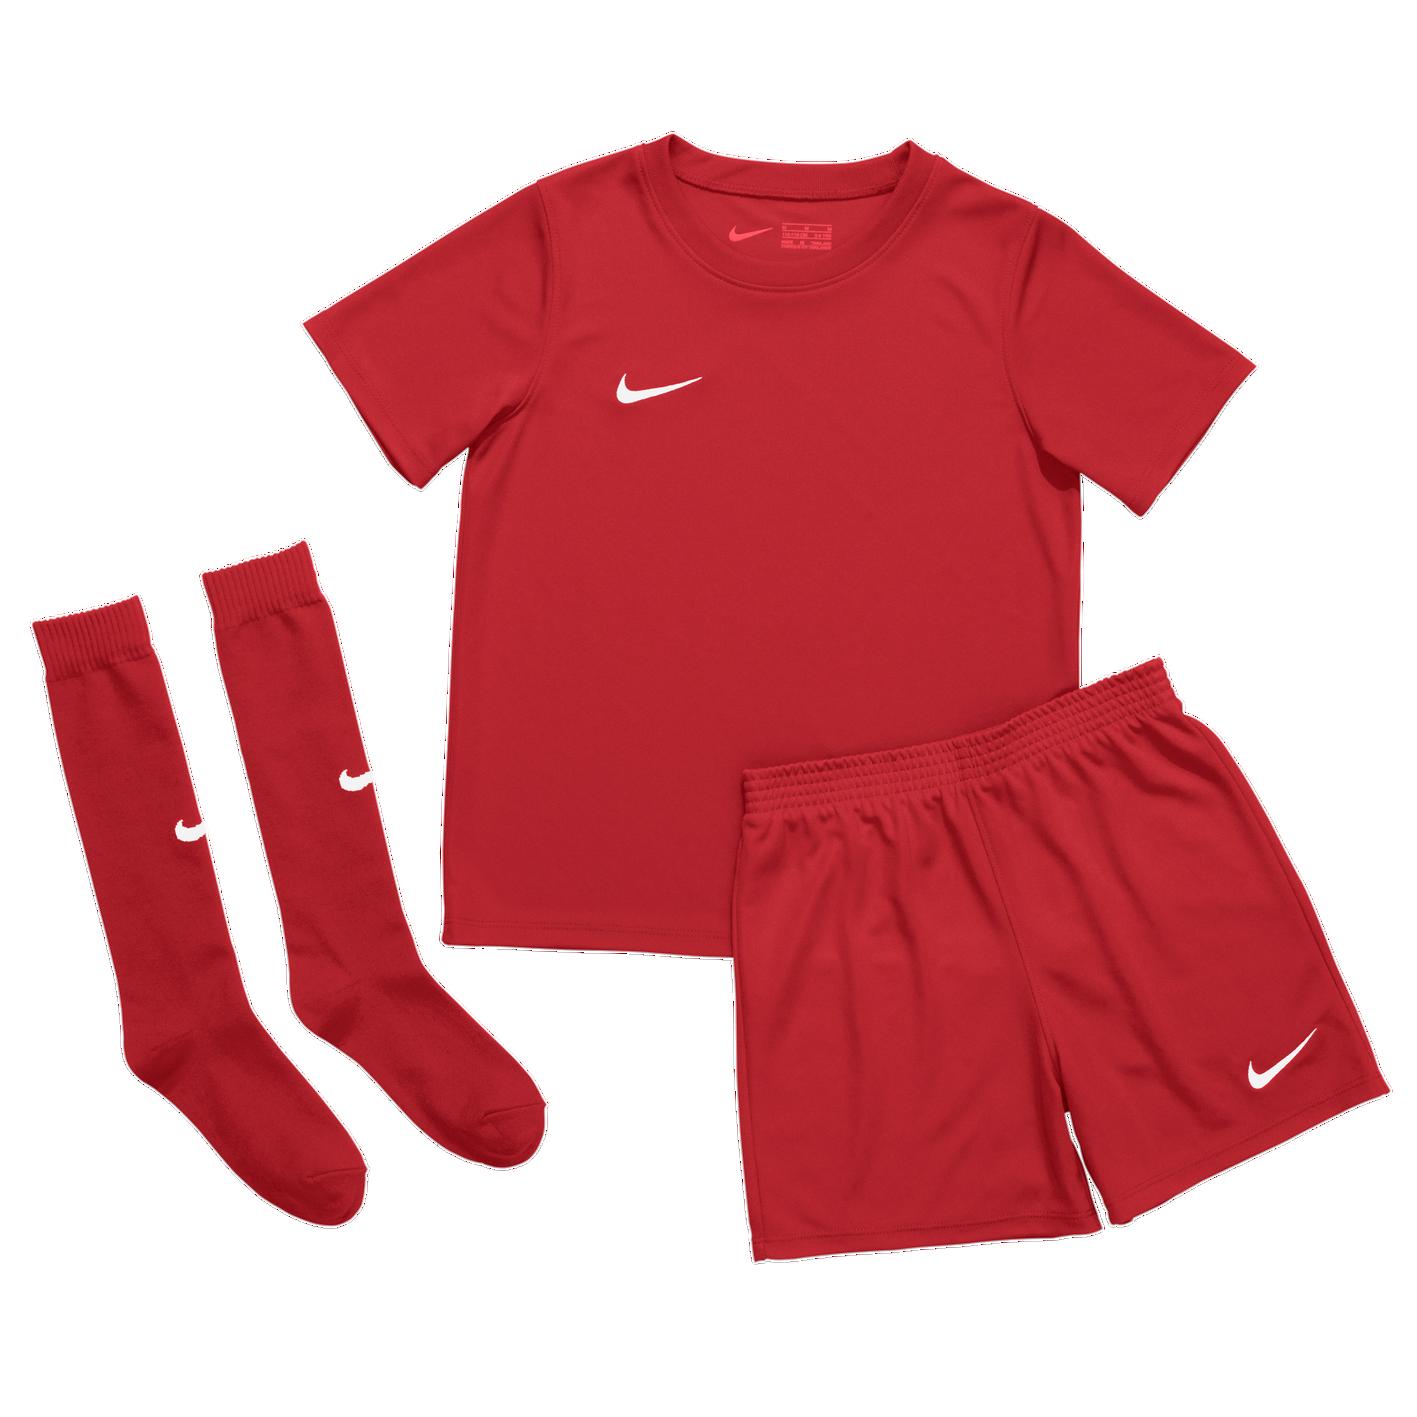 39c280d4b Nike Team Dry Park Kit Set - Boys  Grade School - Soccer - Clothing ...